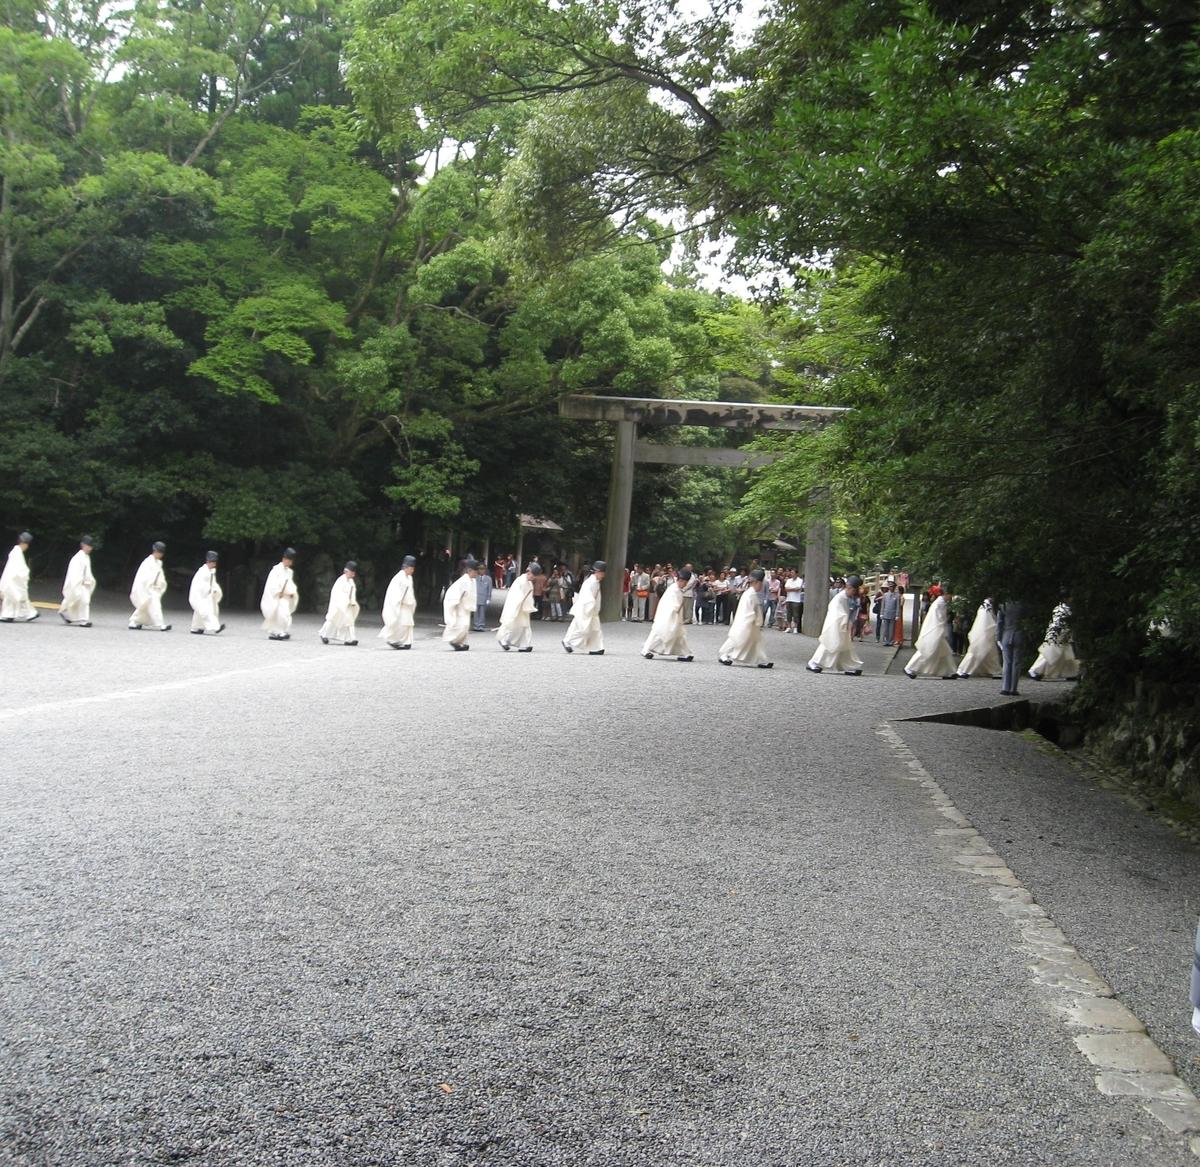 f:id:nakaimamarunosuke:20200612221929j:plain